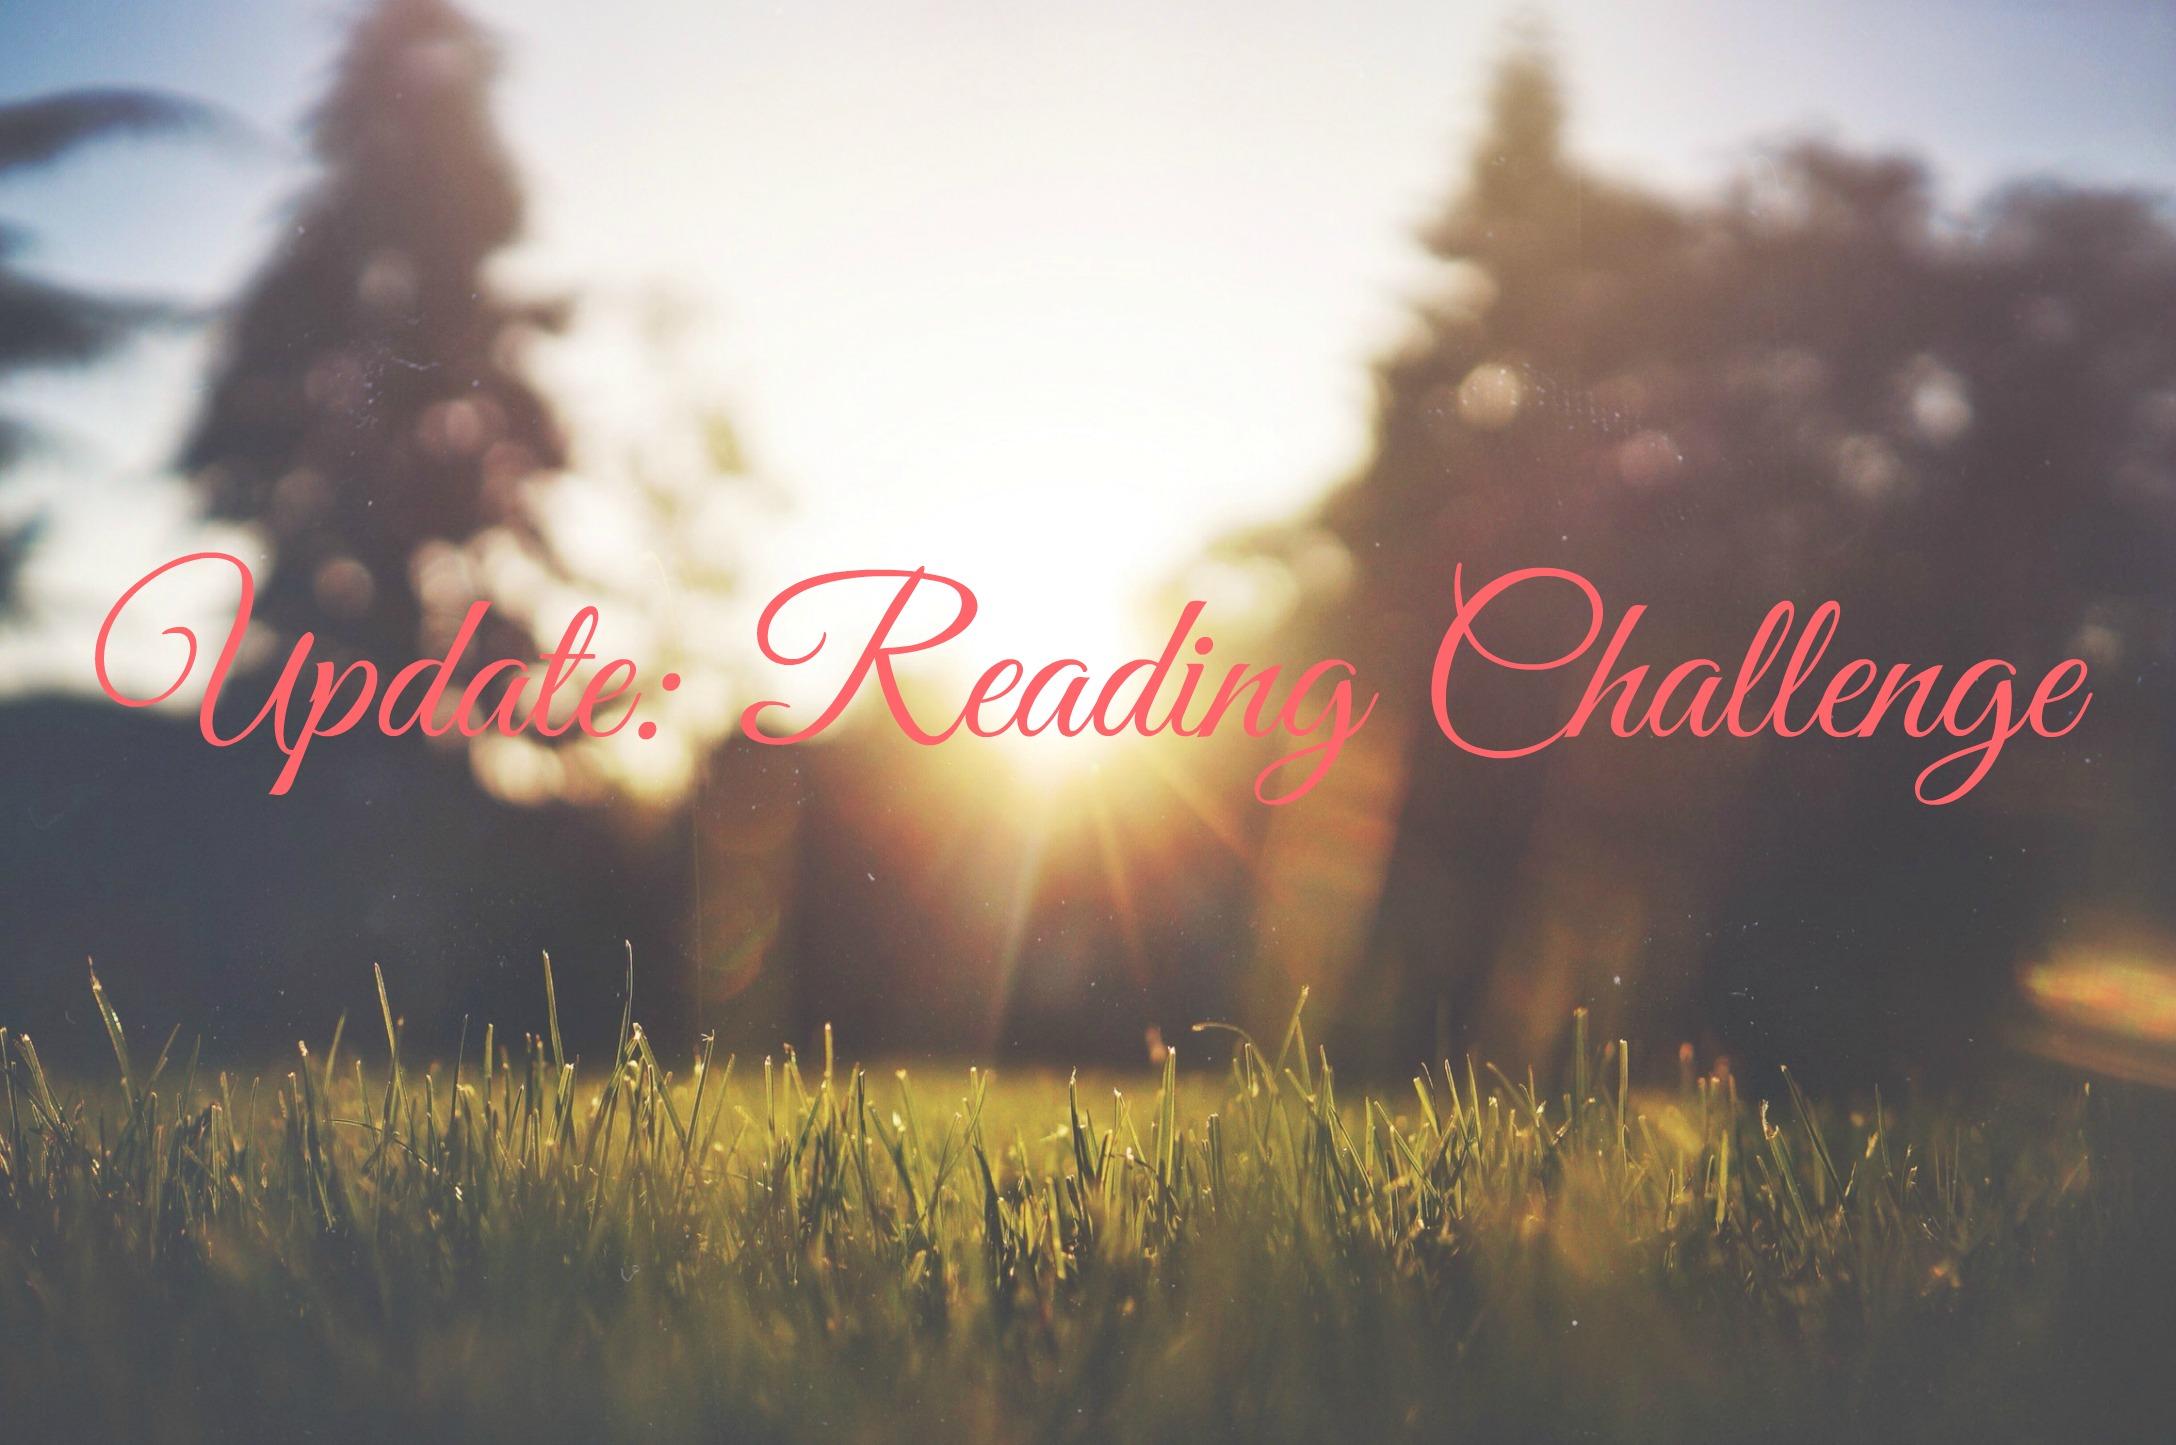 Update Reading Challenge